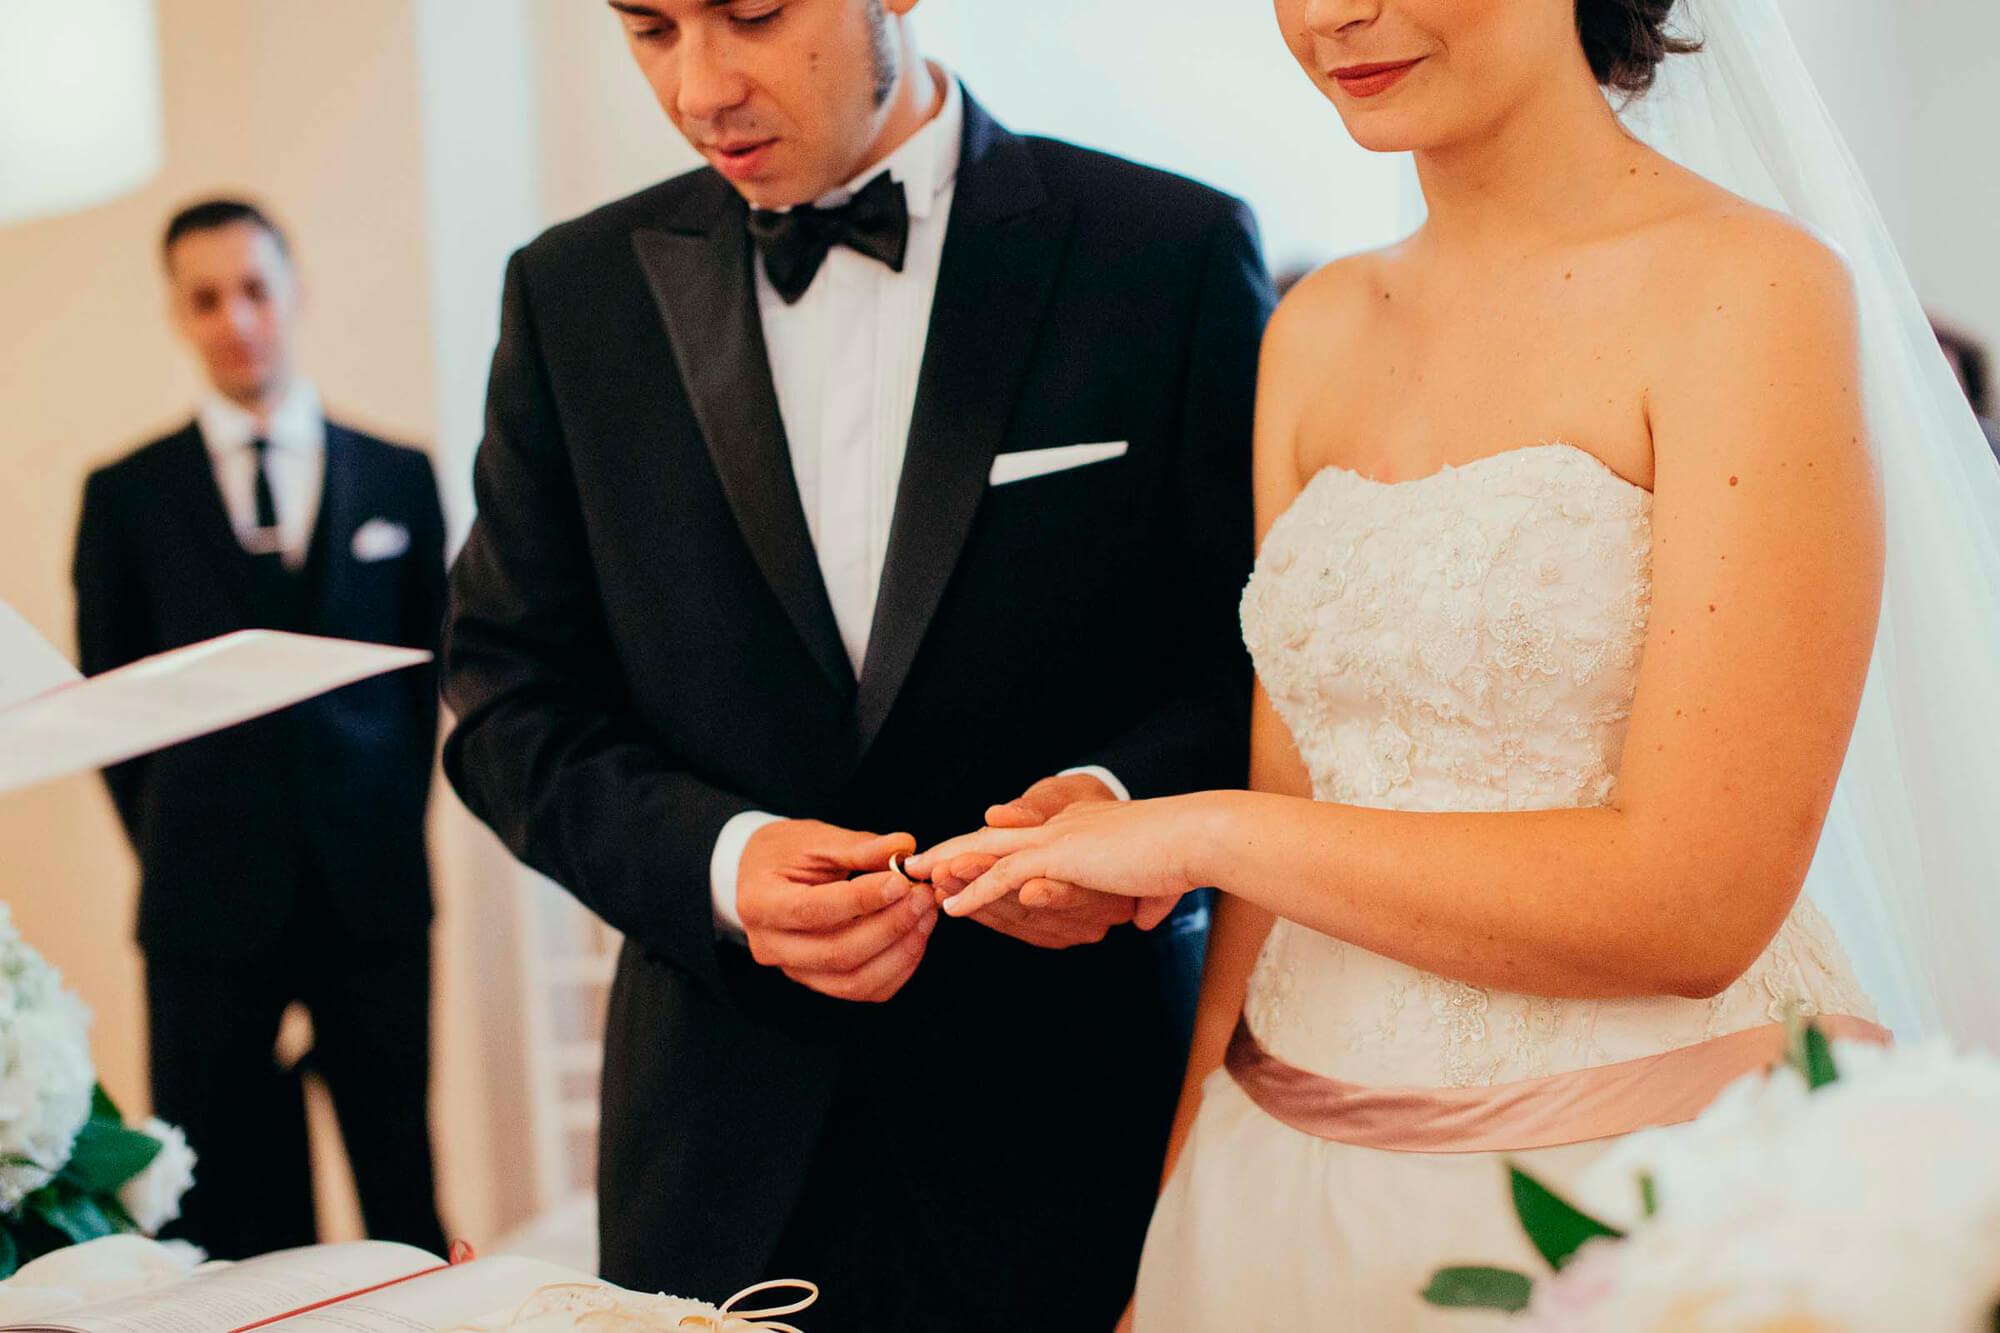 062-arezzo-wedding-photographer.jpg